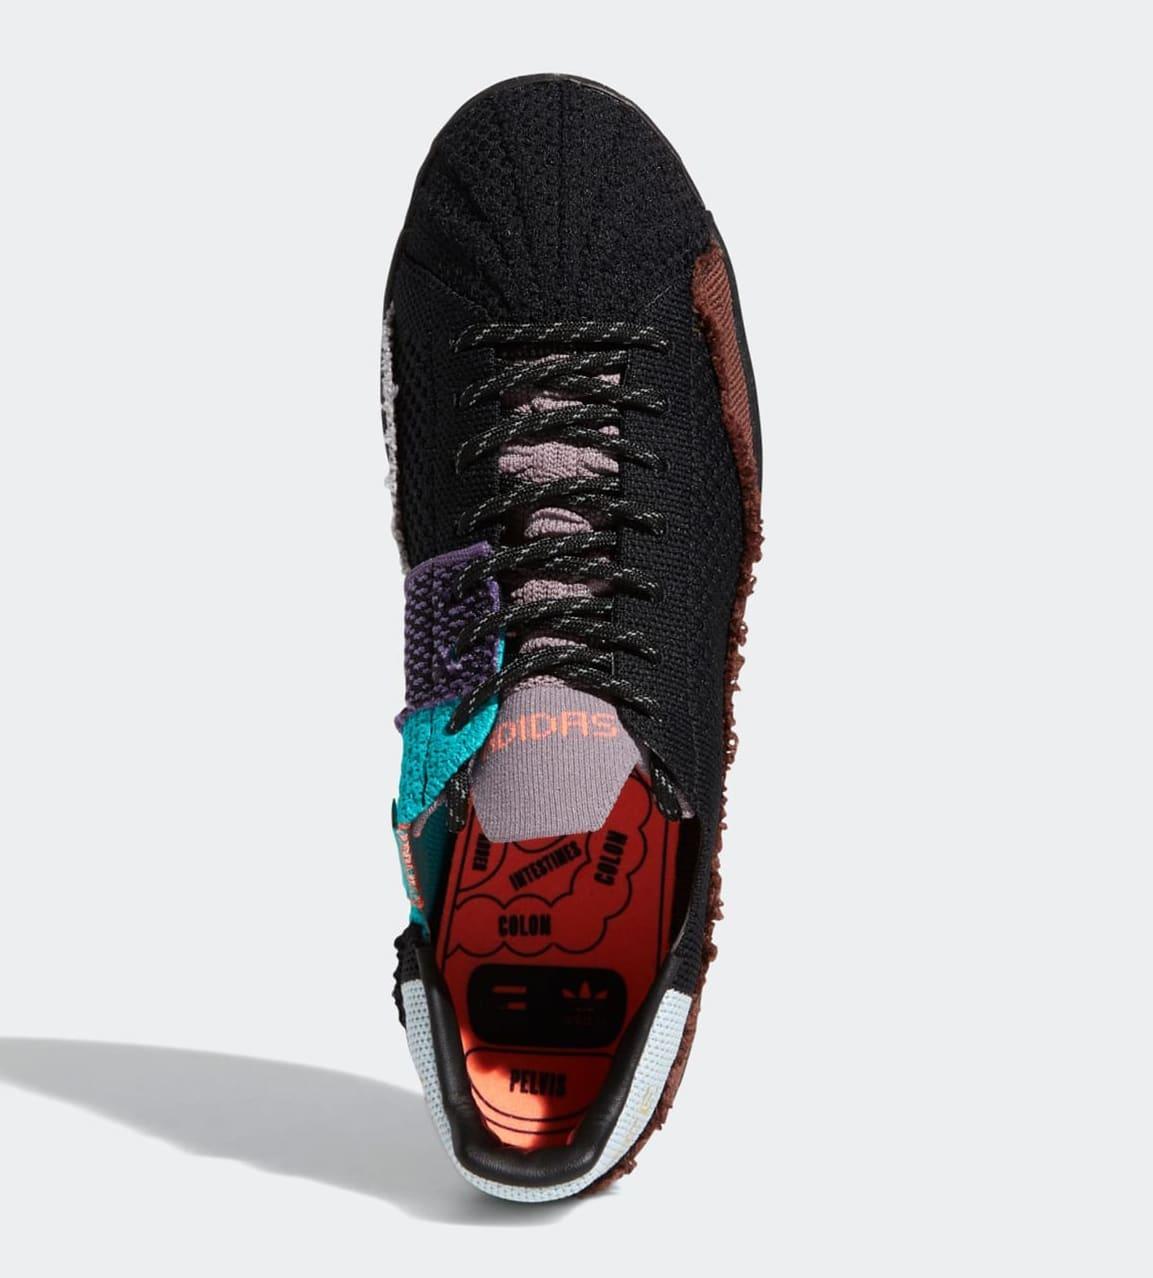 Pharrell Williams x Adidas Superstar Black FY1787 Top